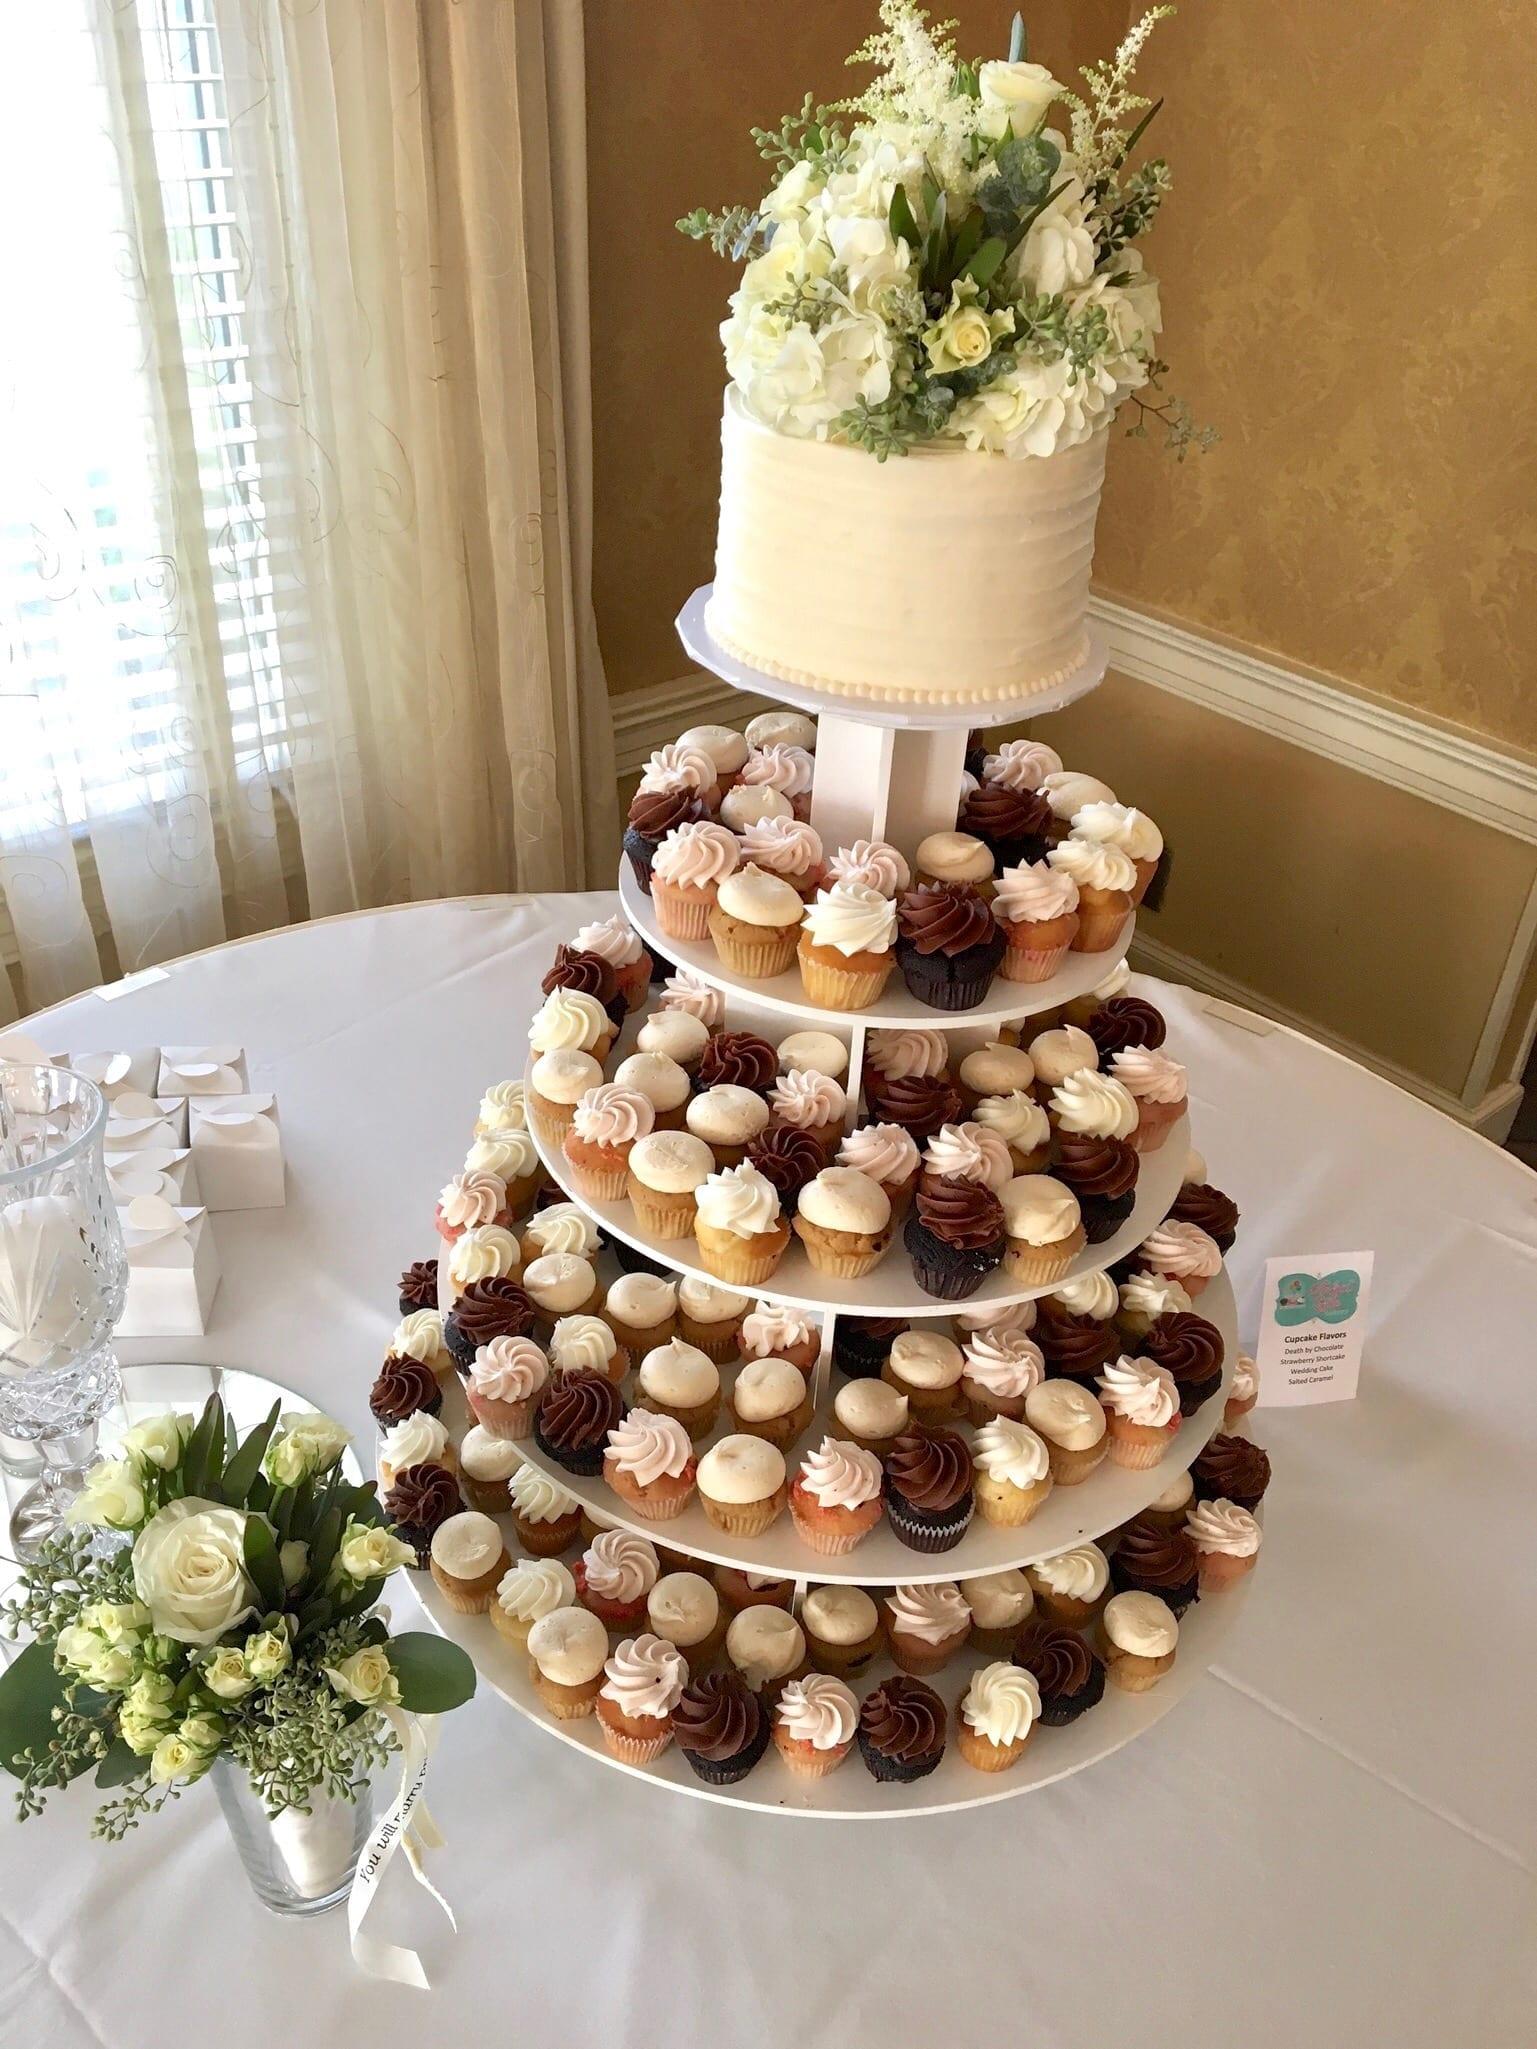 Mini Cupcake Wedding Dessert Display with Rustic Cutting Cake | 3 Sweet Girls Cakery